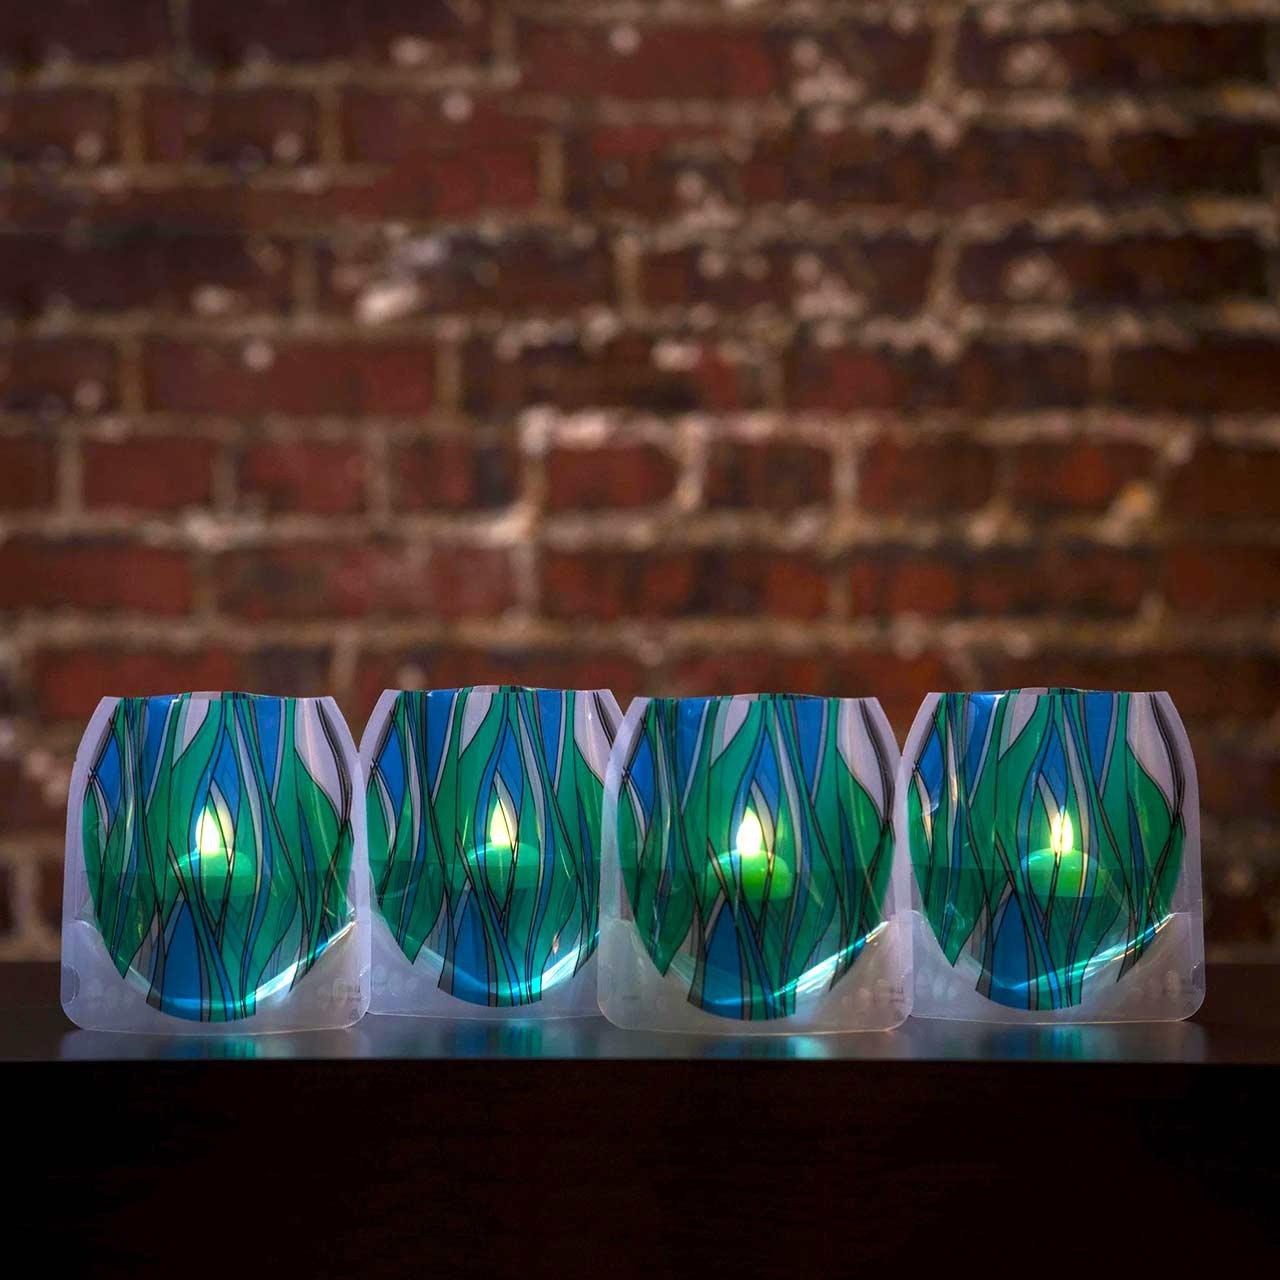 Modgy Heedo Luminary Lanterns (set of 4) | The Design Gift Shop